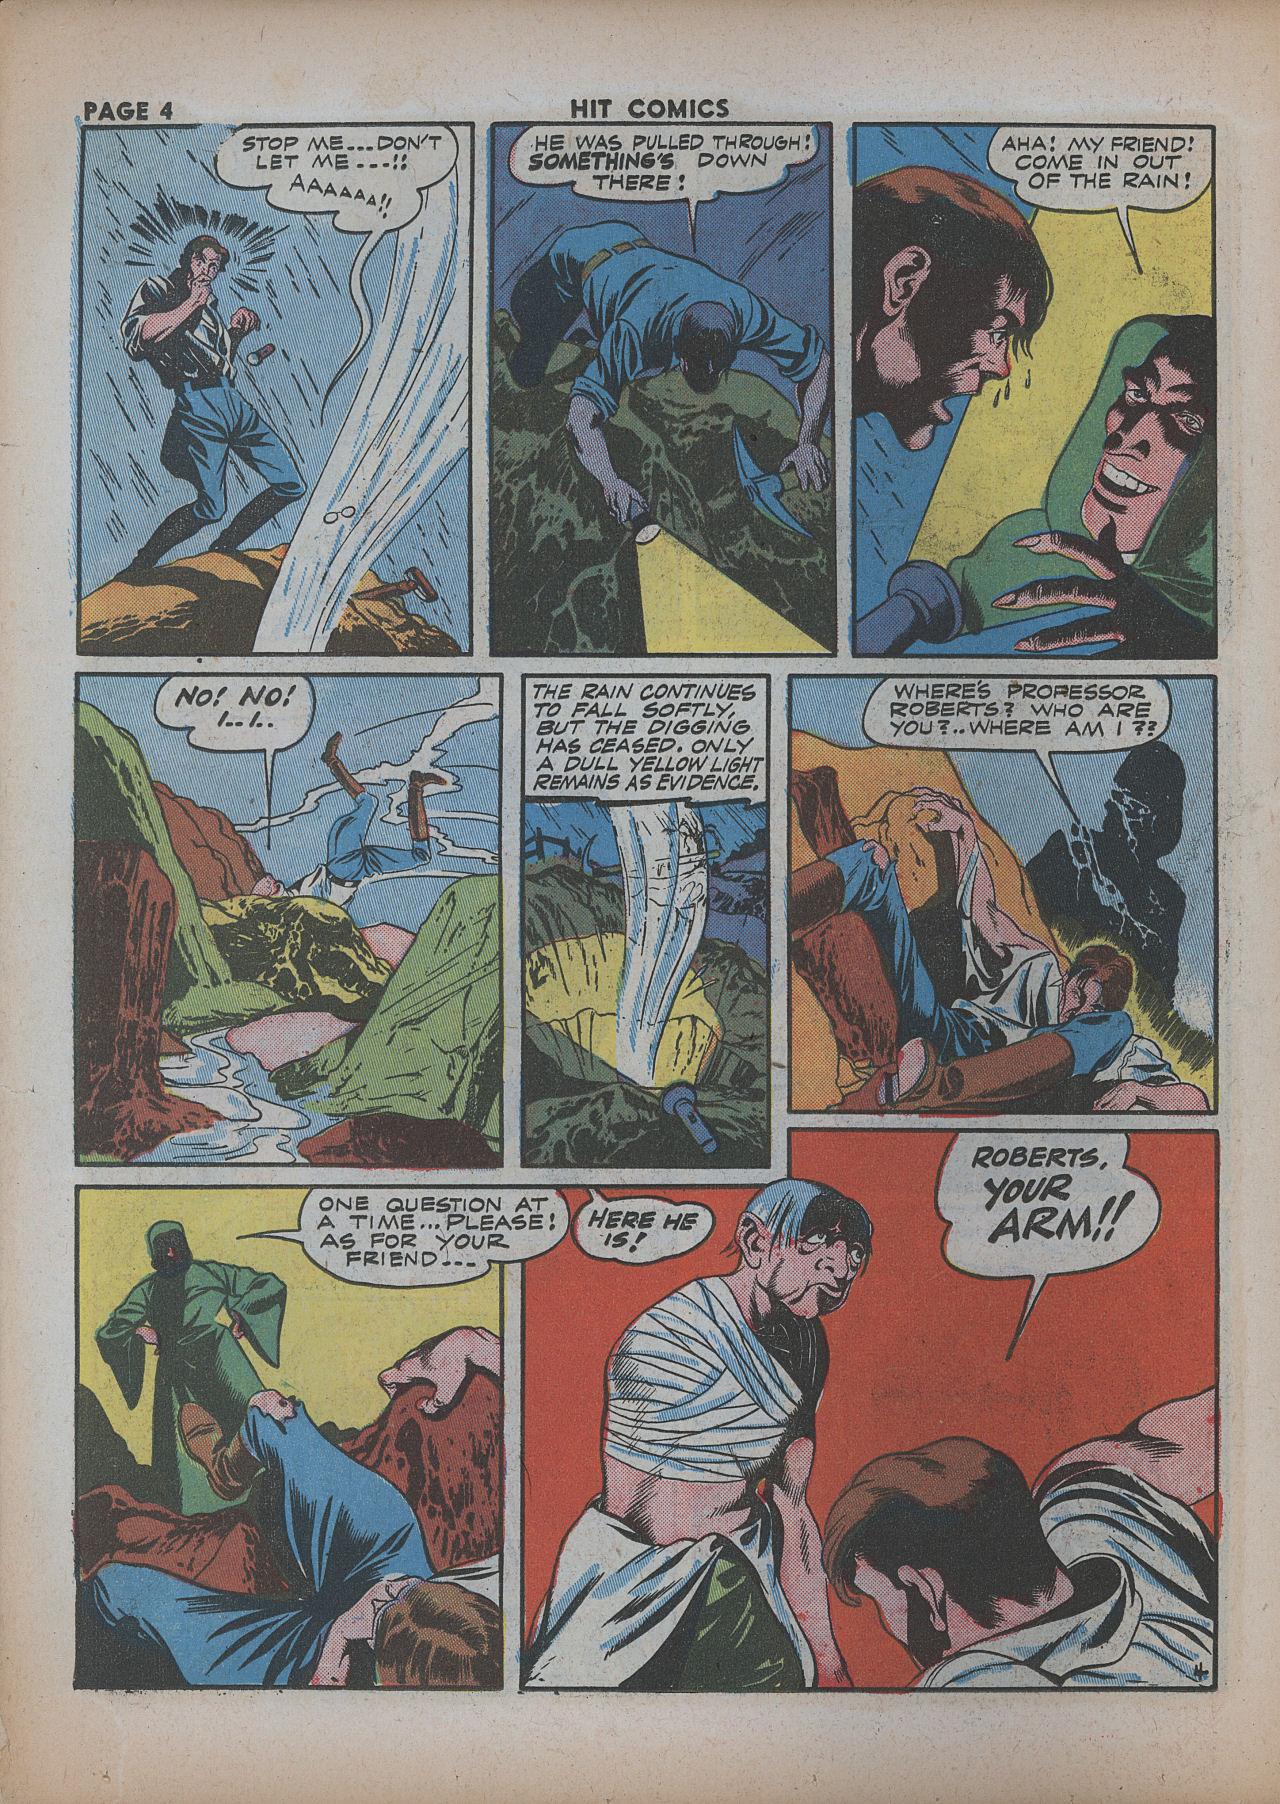 Read online Hit Comics comic -  Issue #26 - 6